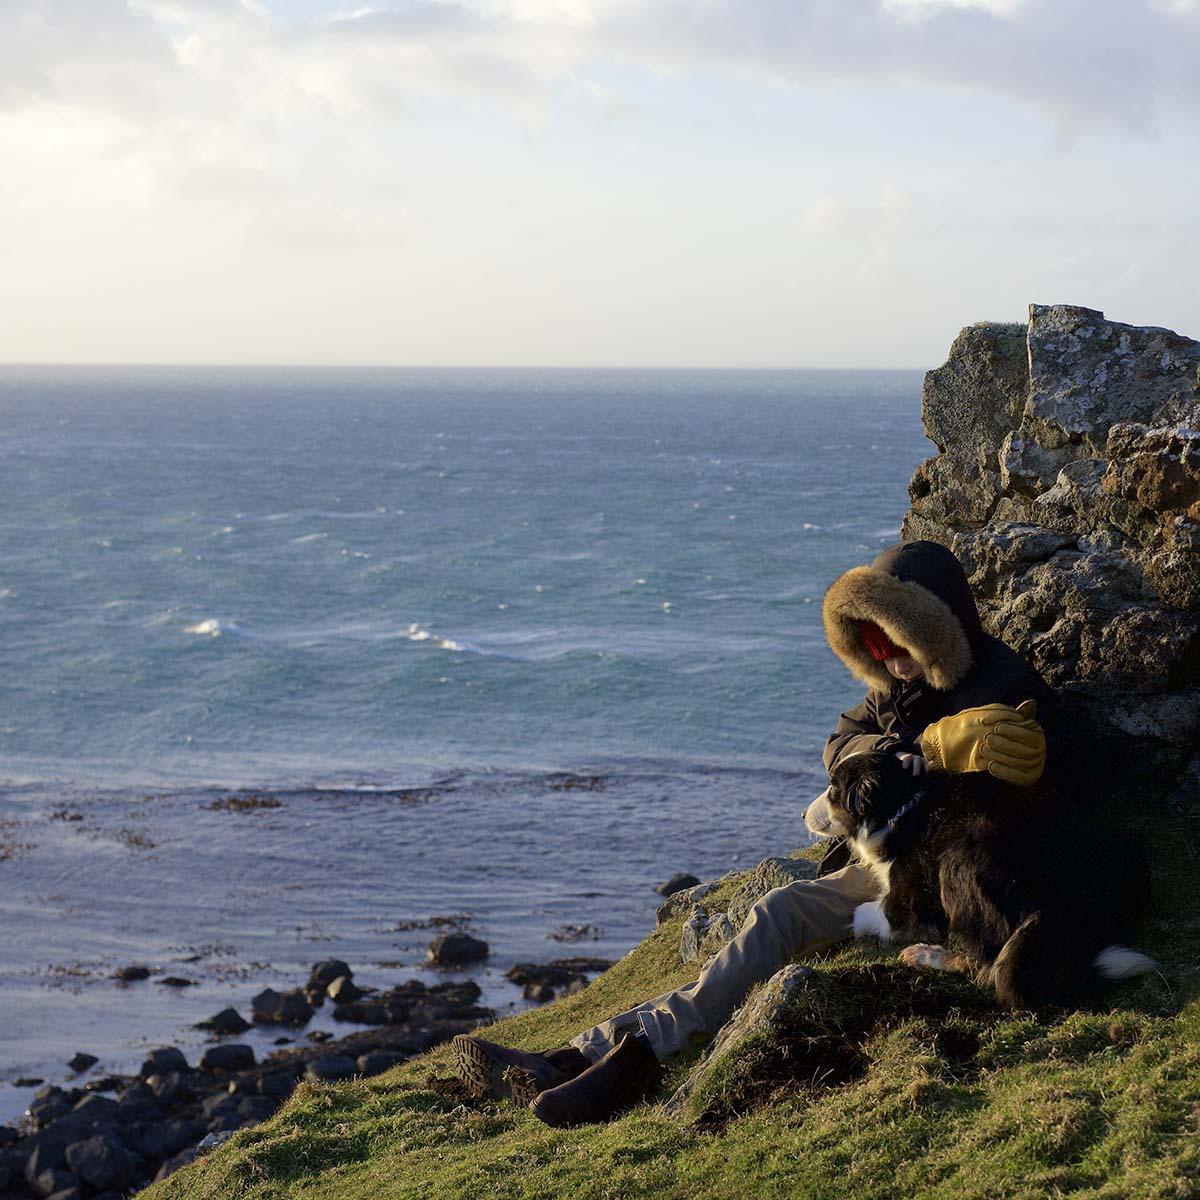 Treshnish, Mull, self-catering, winter walks with dog